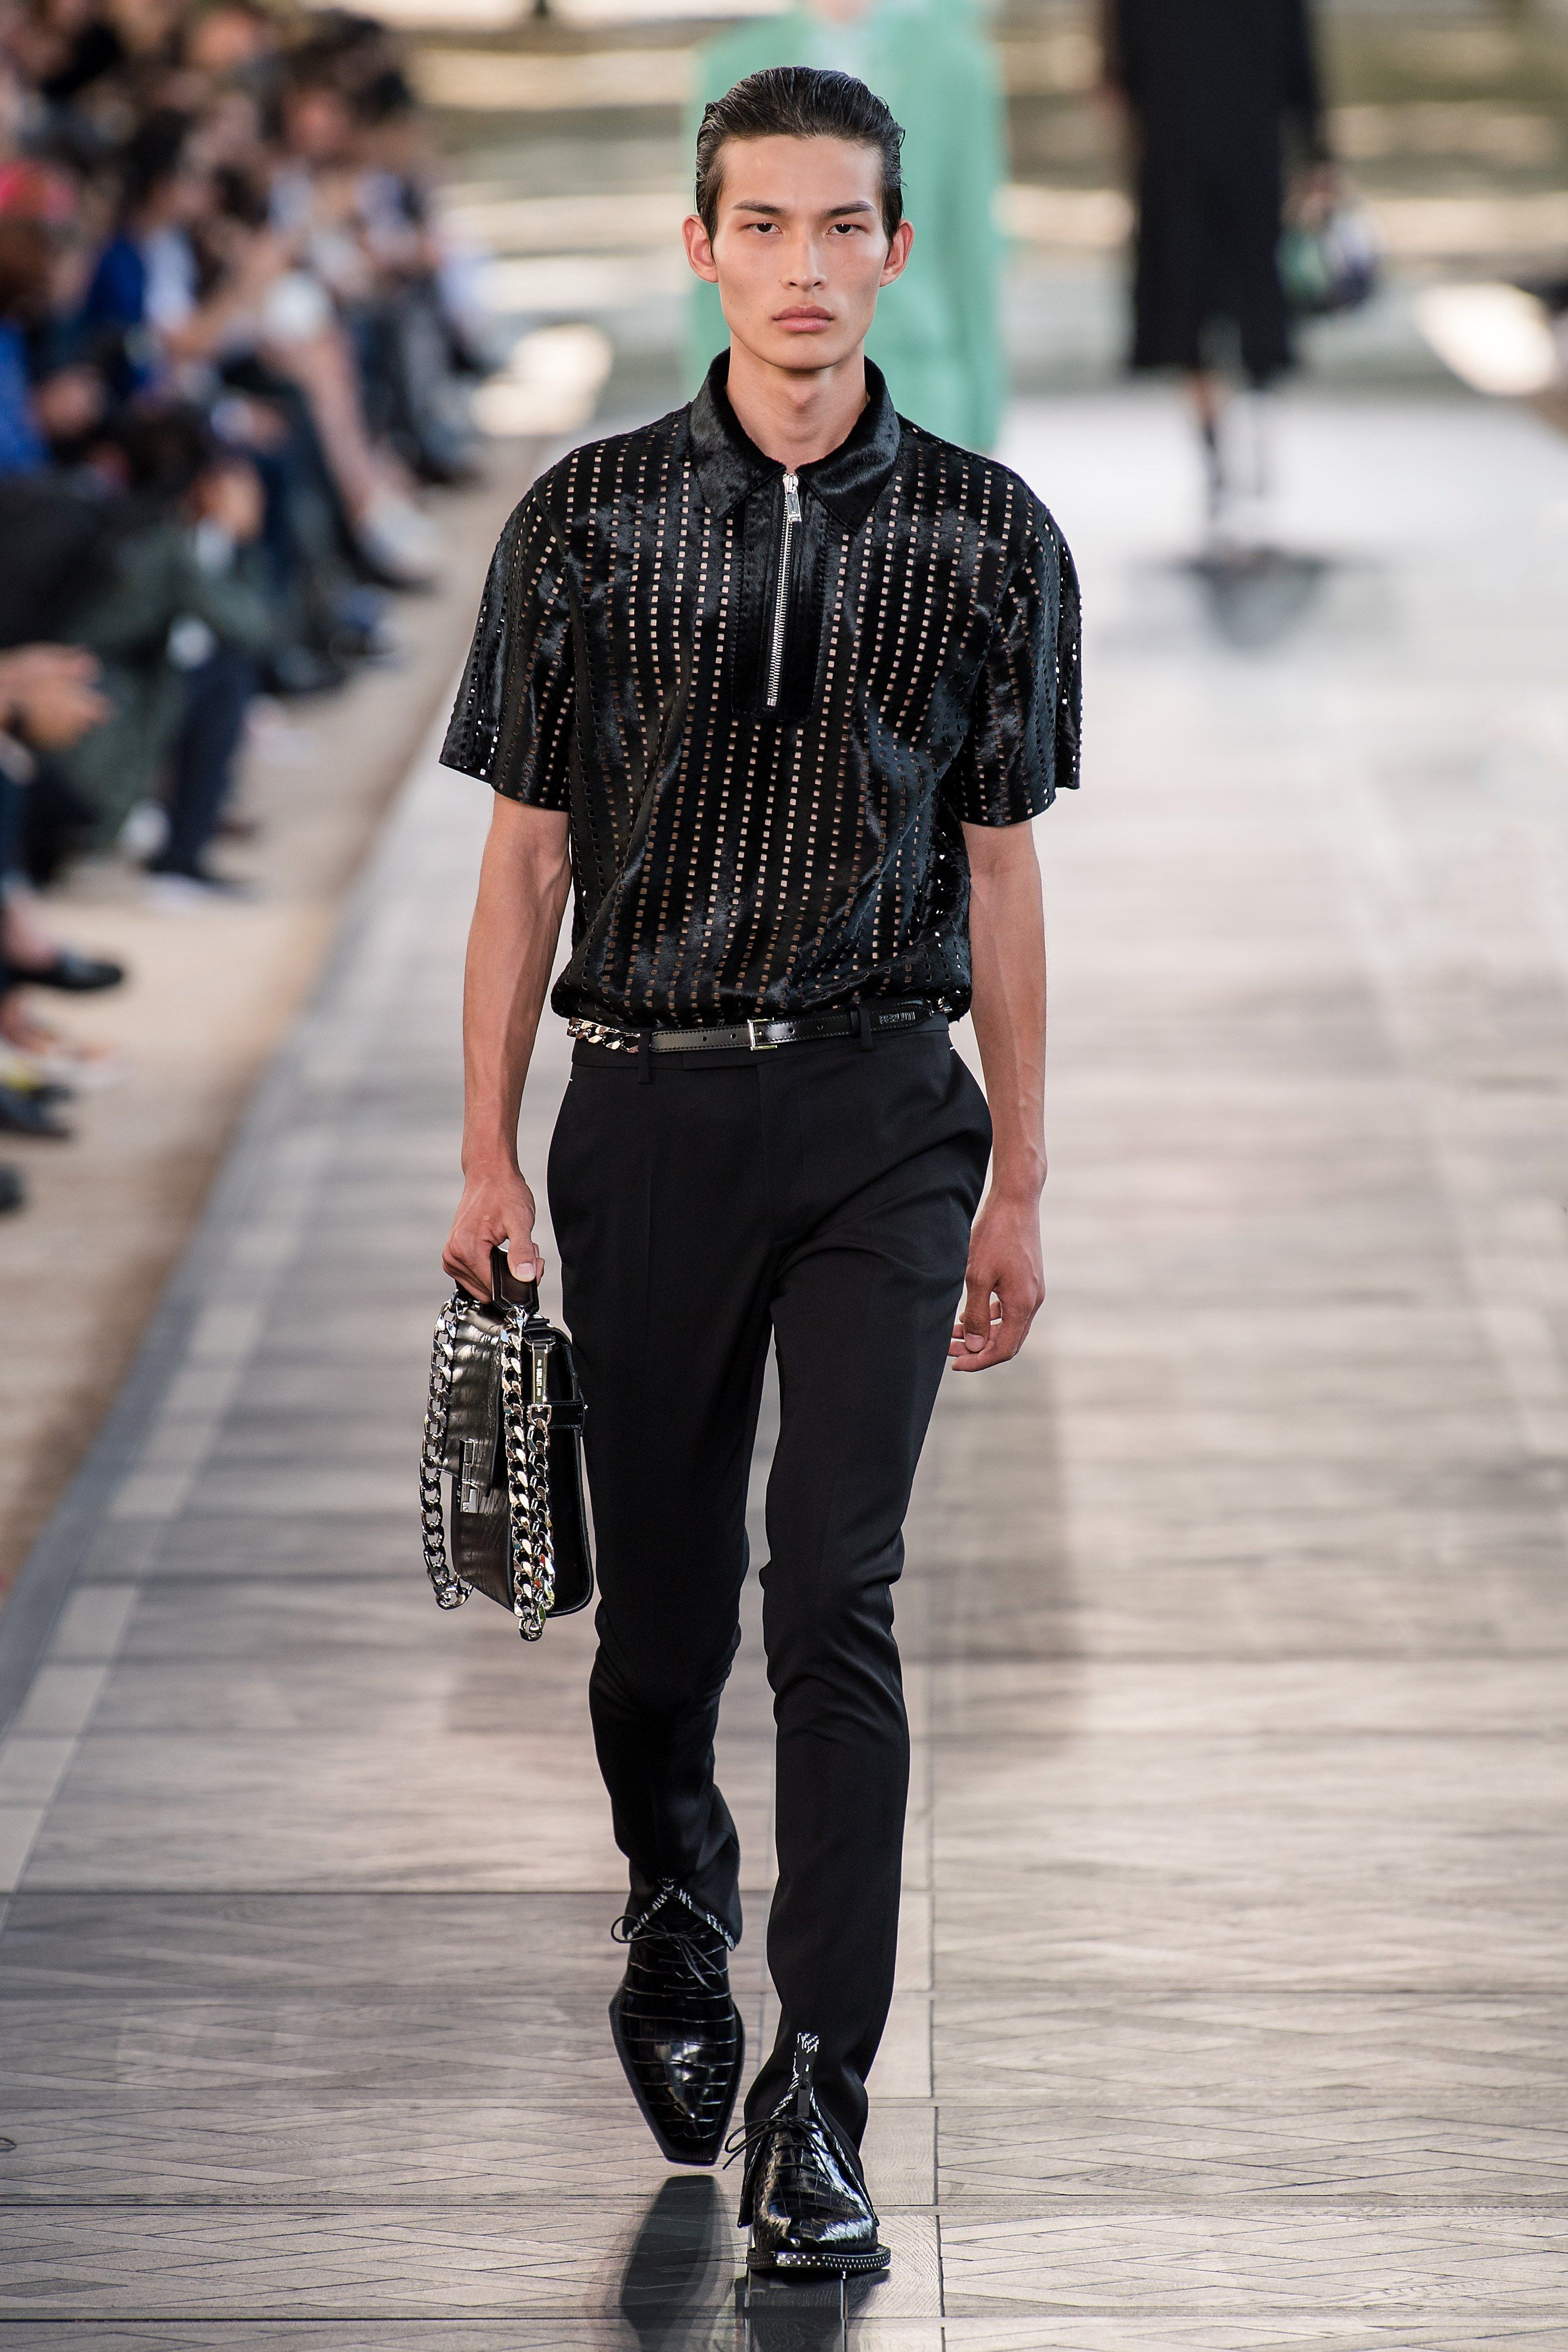 Berluti Spring 2020 Menswear Fashion Show Menswear Mens Fashion Grunge Vogue Men